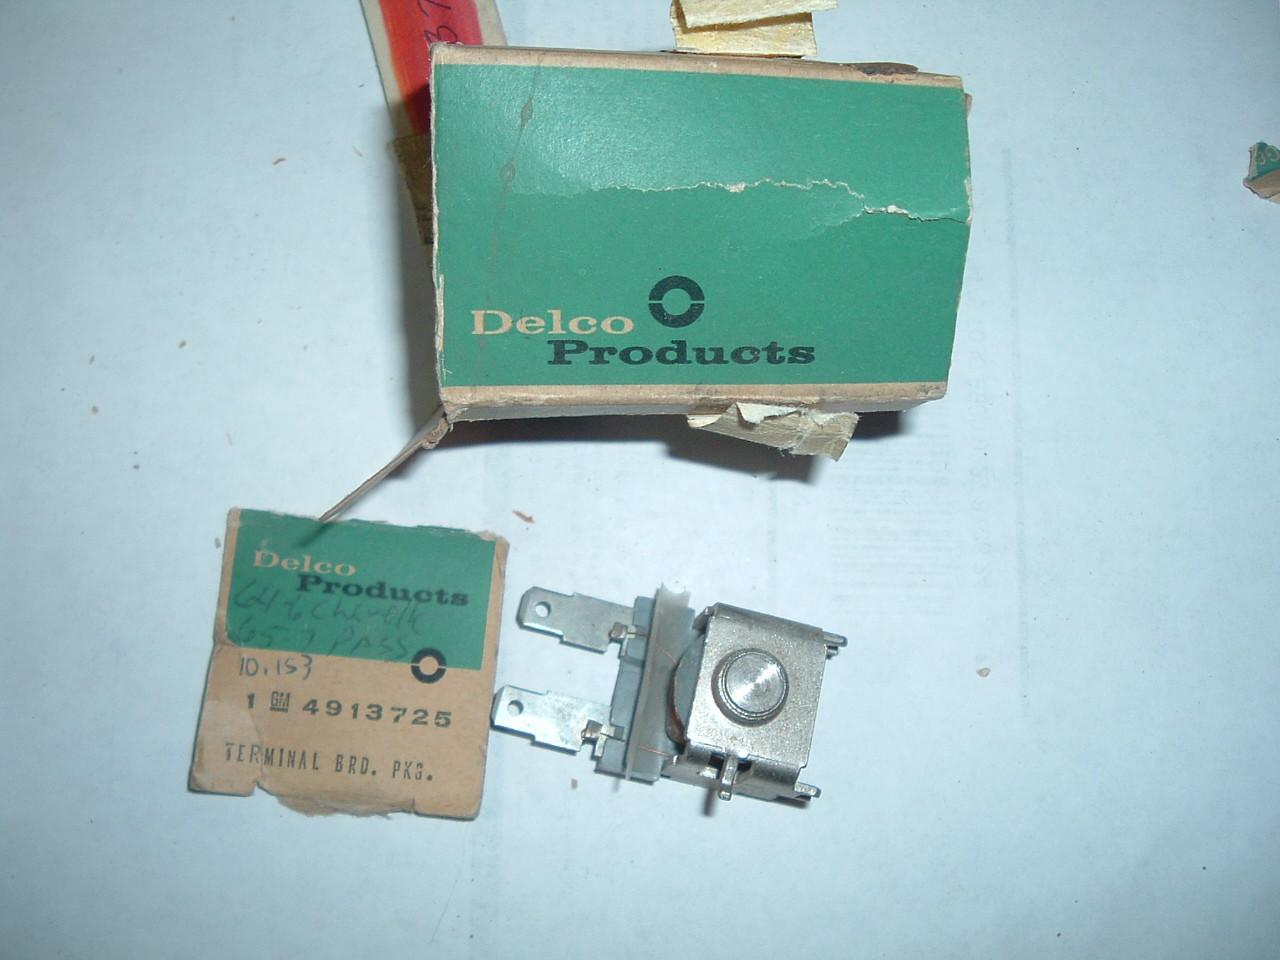 1964 65 66 67 chevelle cutlass impala windshield wiper terminal board nos gm # 4913725 (z 4913725)